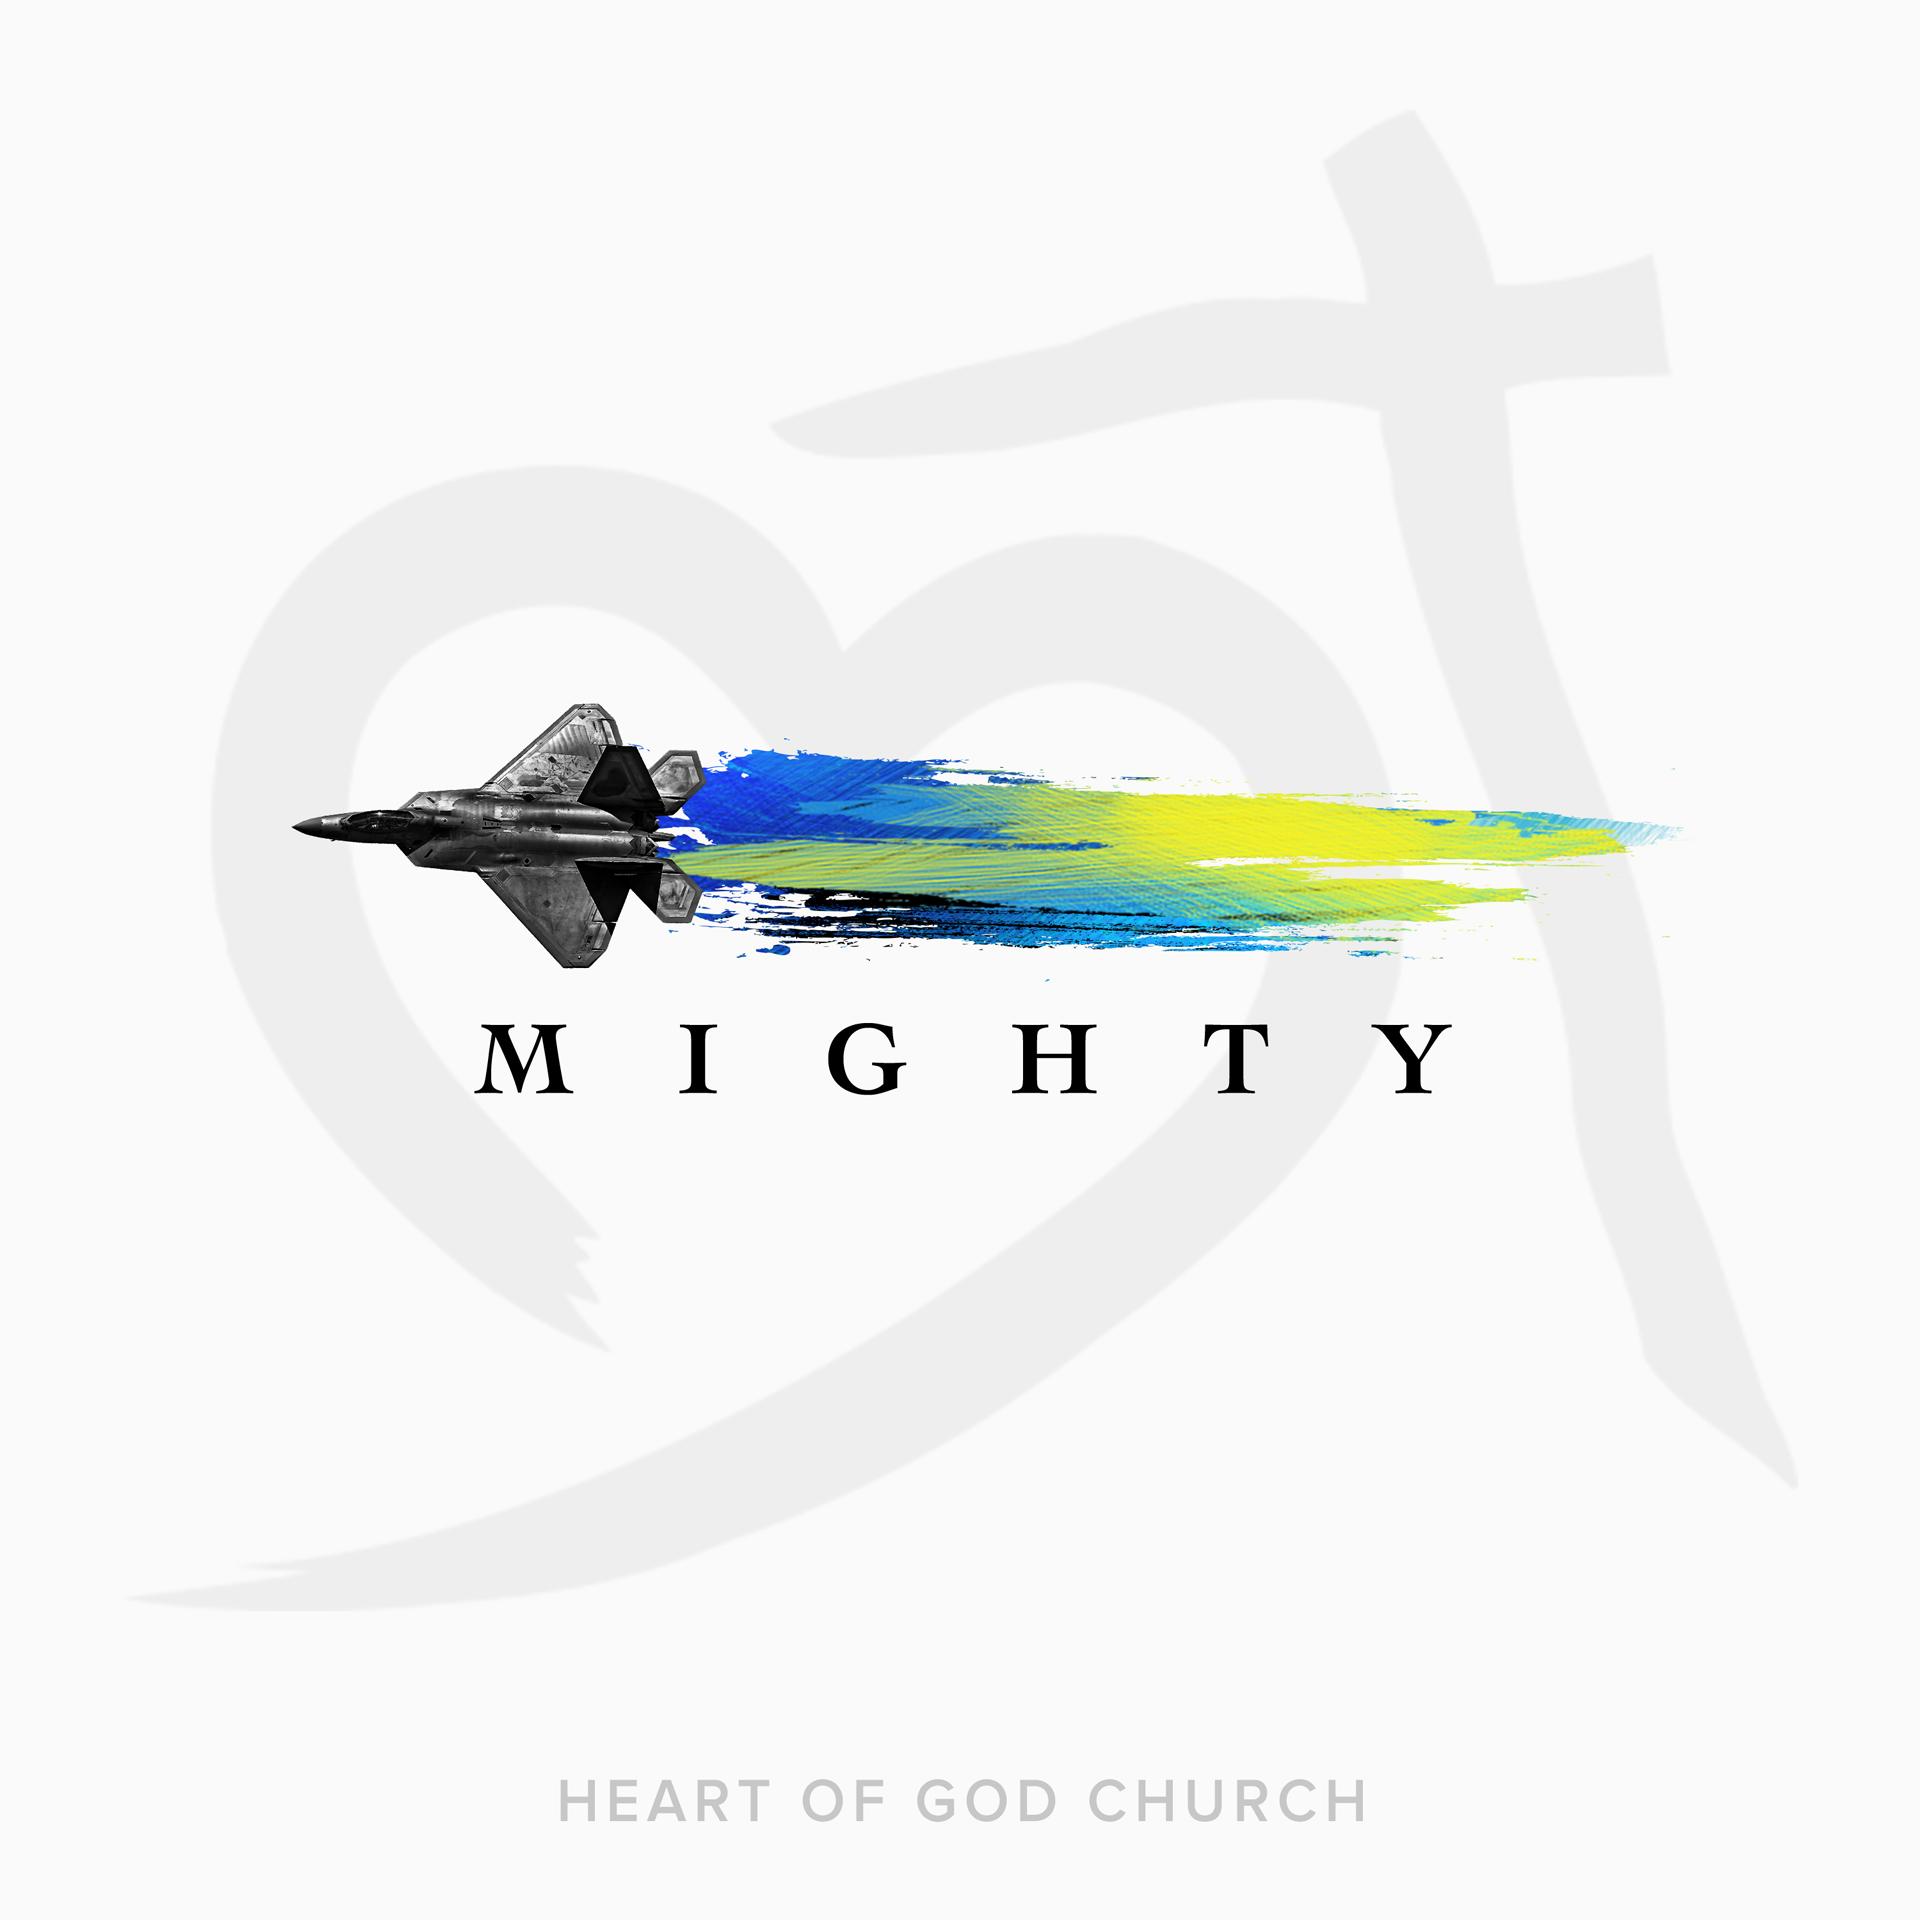 Heart-of-God-Church_-Mighty-Single_3000x3000_web2.jpg